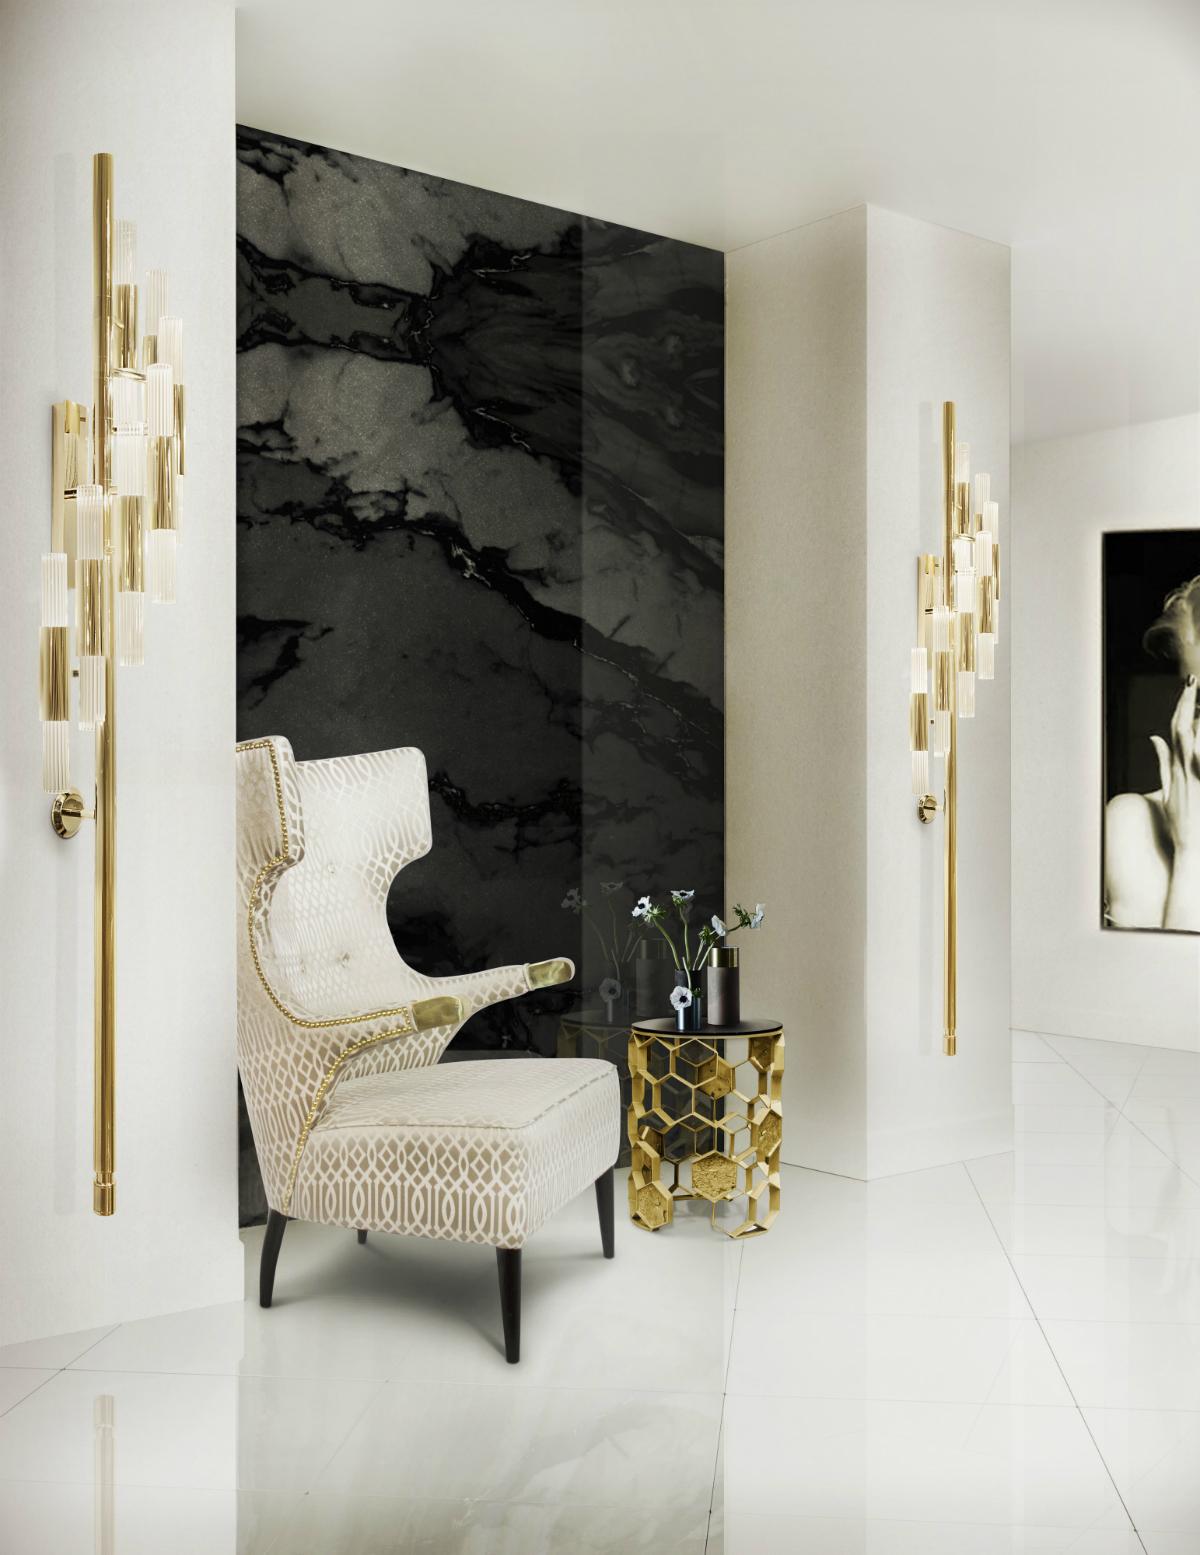 living room ideas Living Room Ideas For a Luxurious Interior Design Project Living Room Ideas For a Luxurious Interior Design Project 3 min 4